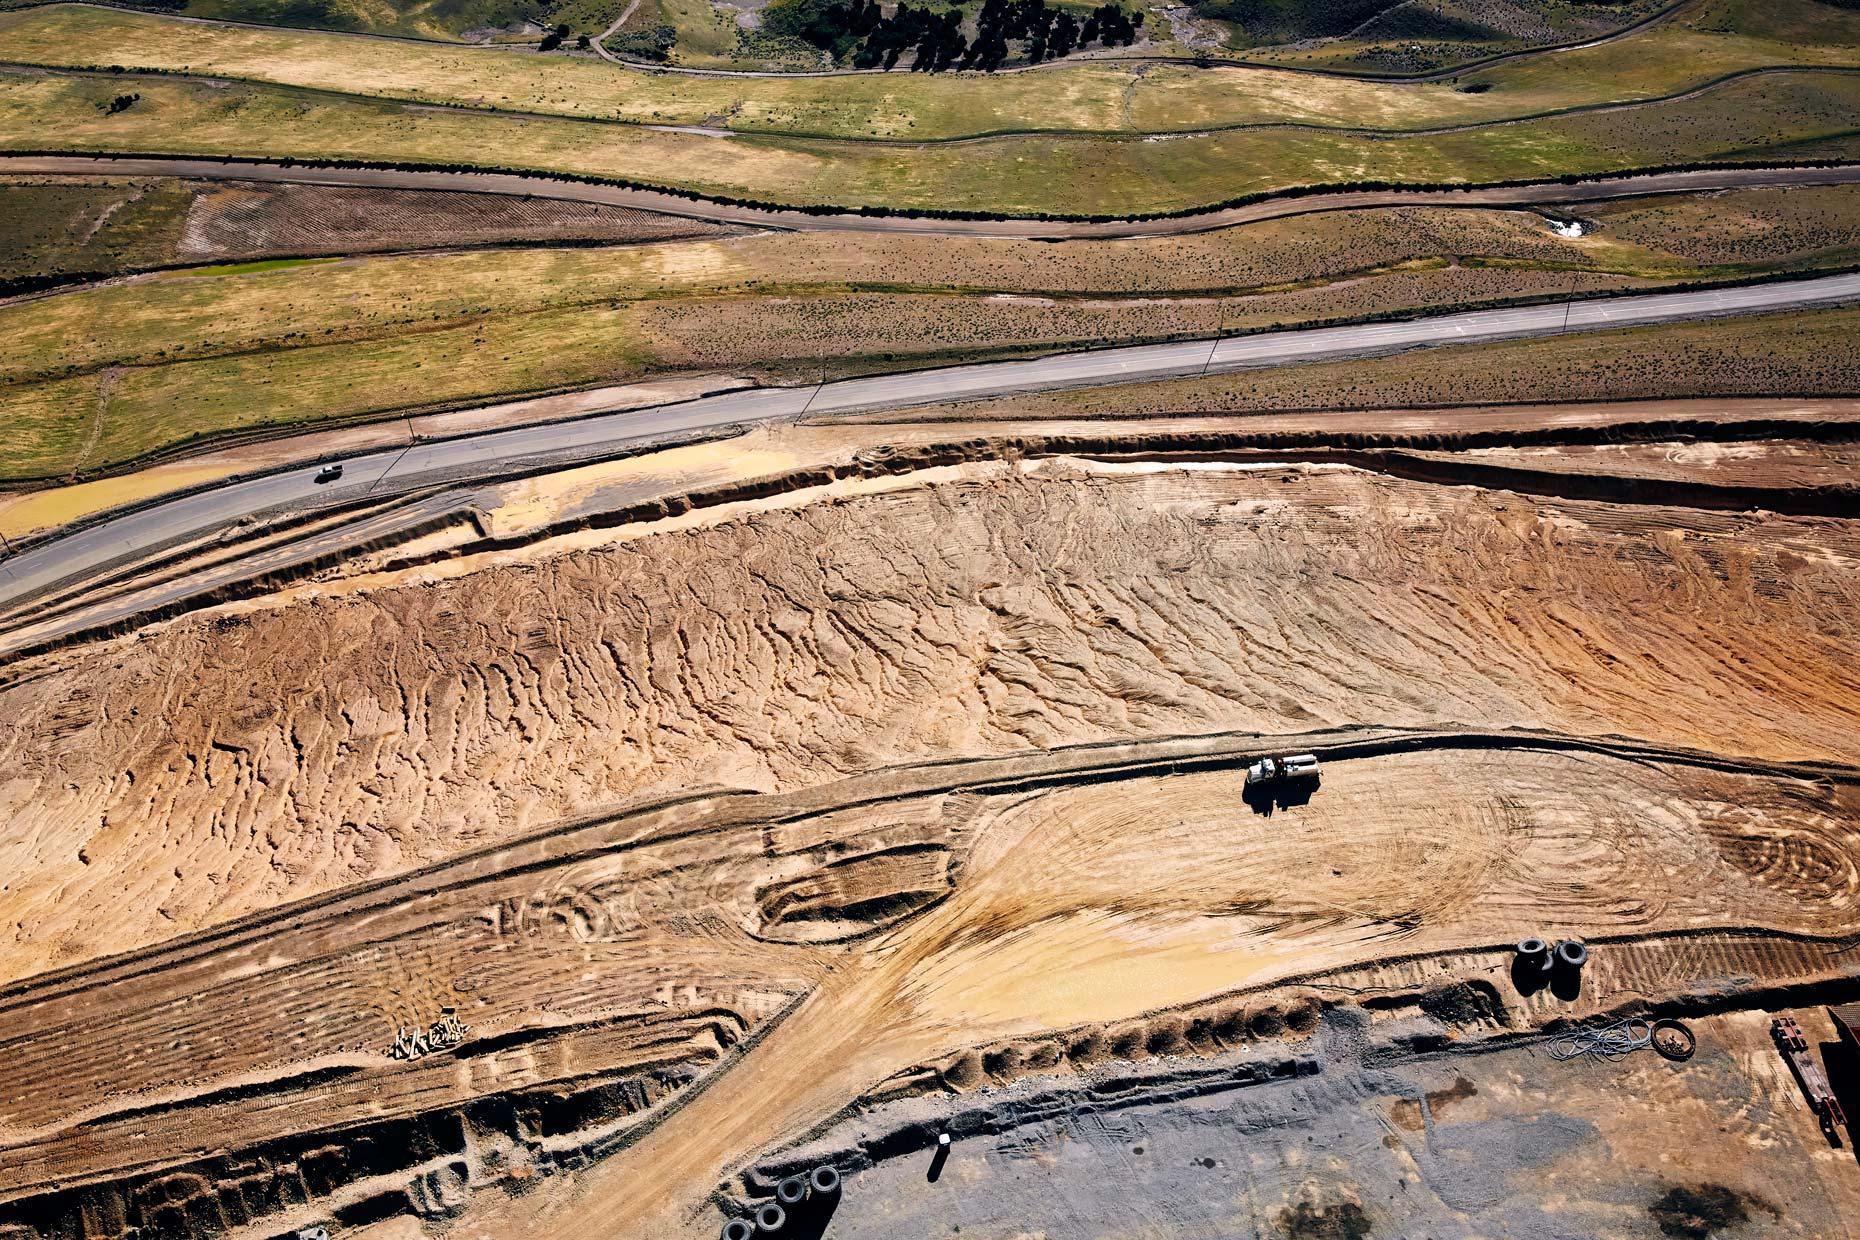 Aerial Photography Kennecott Mining